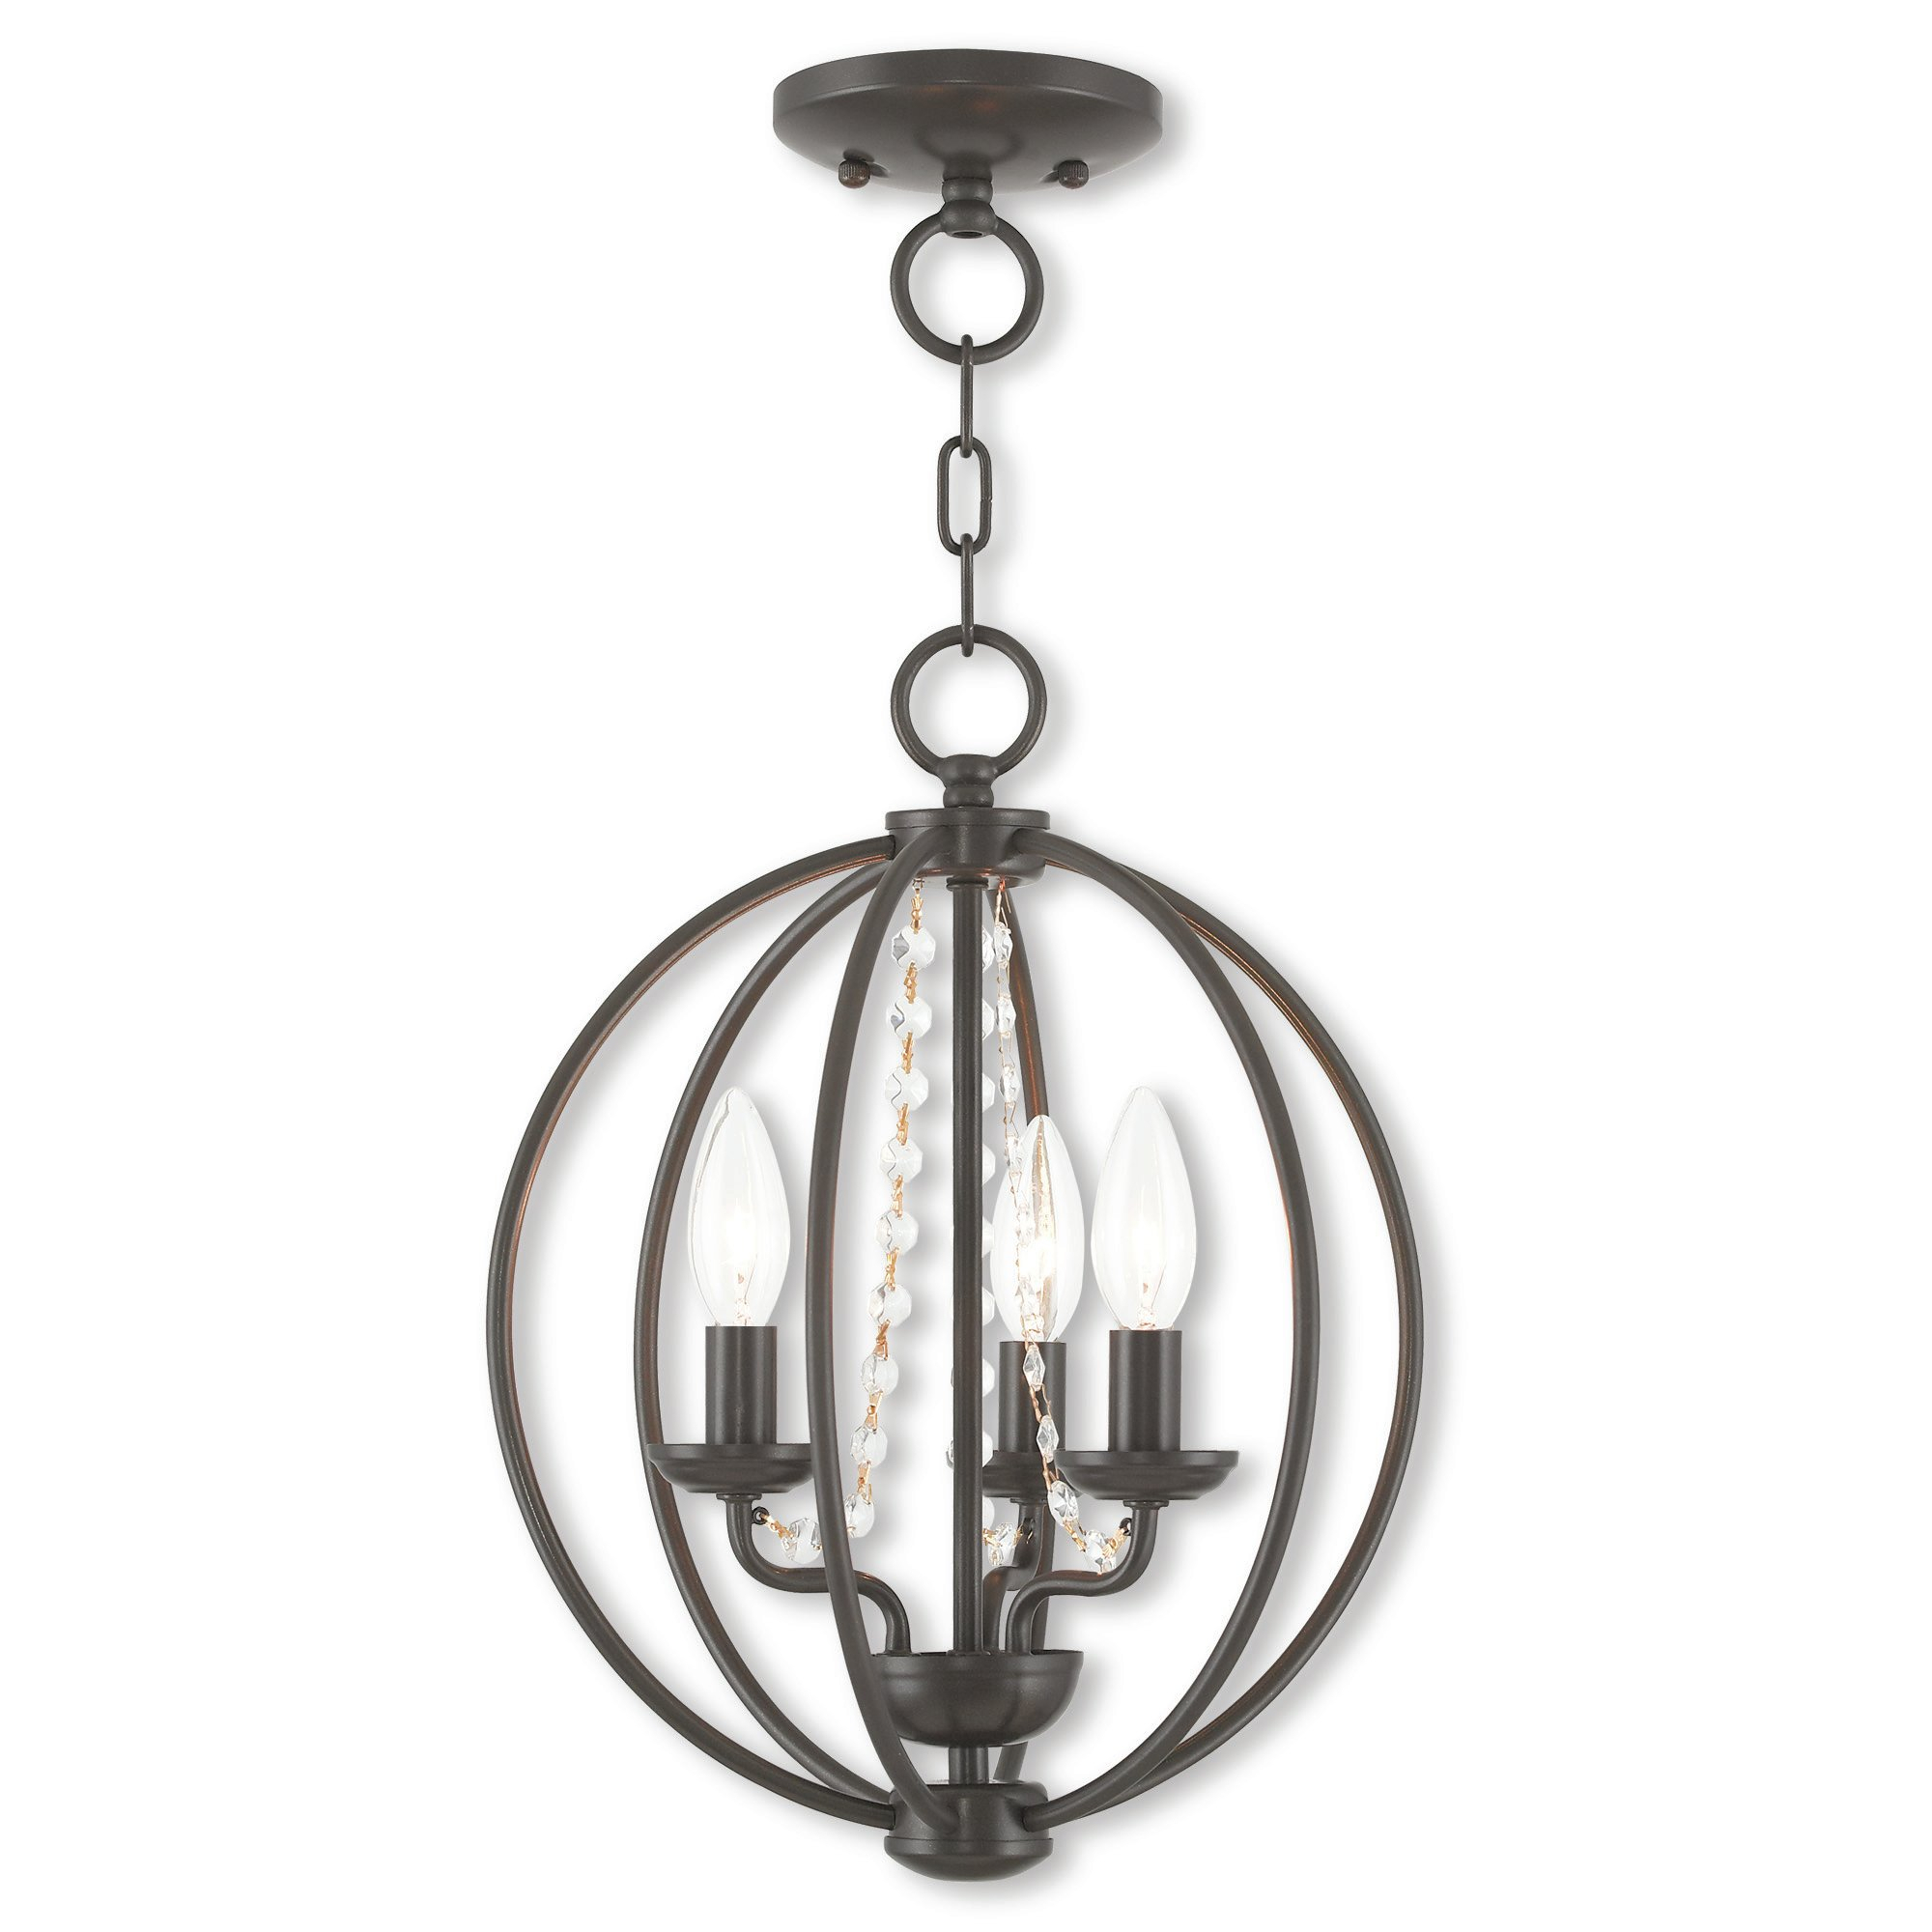 Artus 3 Light Globe Chandelier Regarding Alden 3 Light Single Globe Pendants (View 6 of 30)